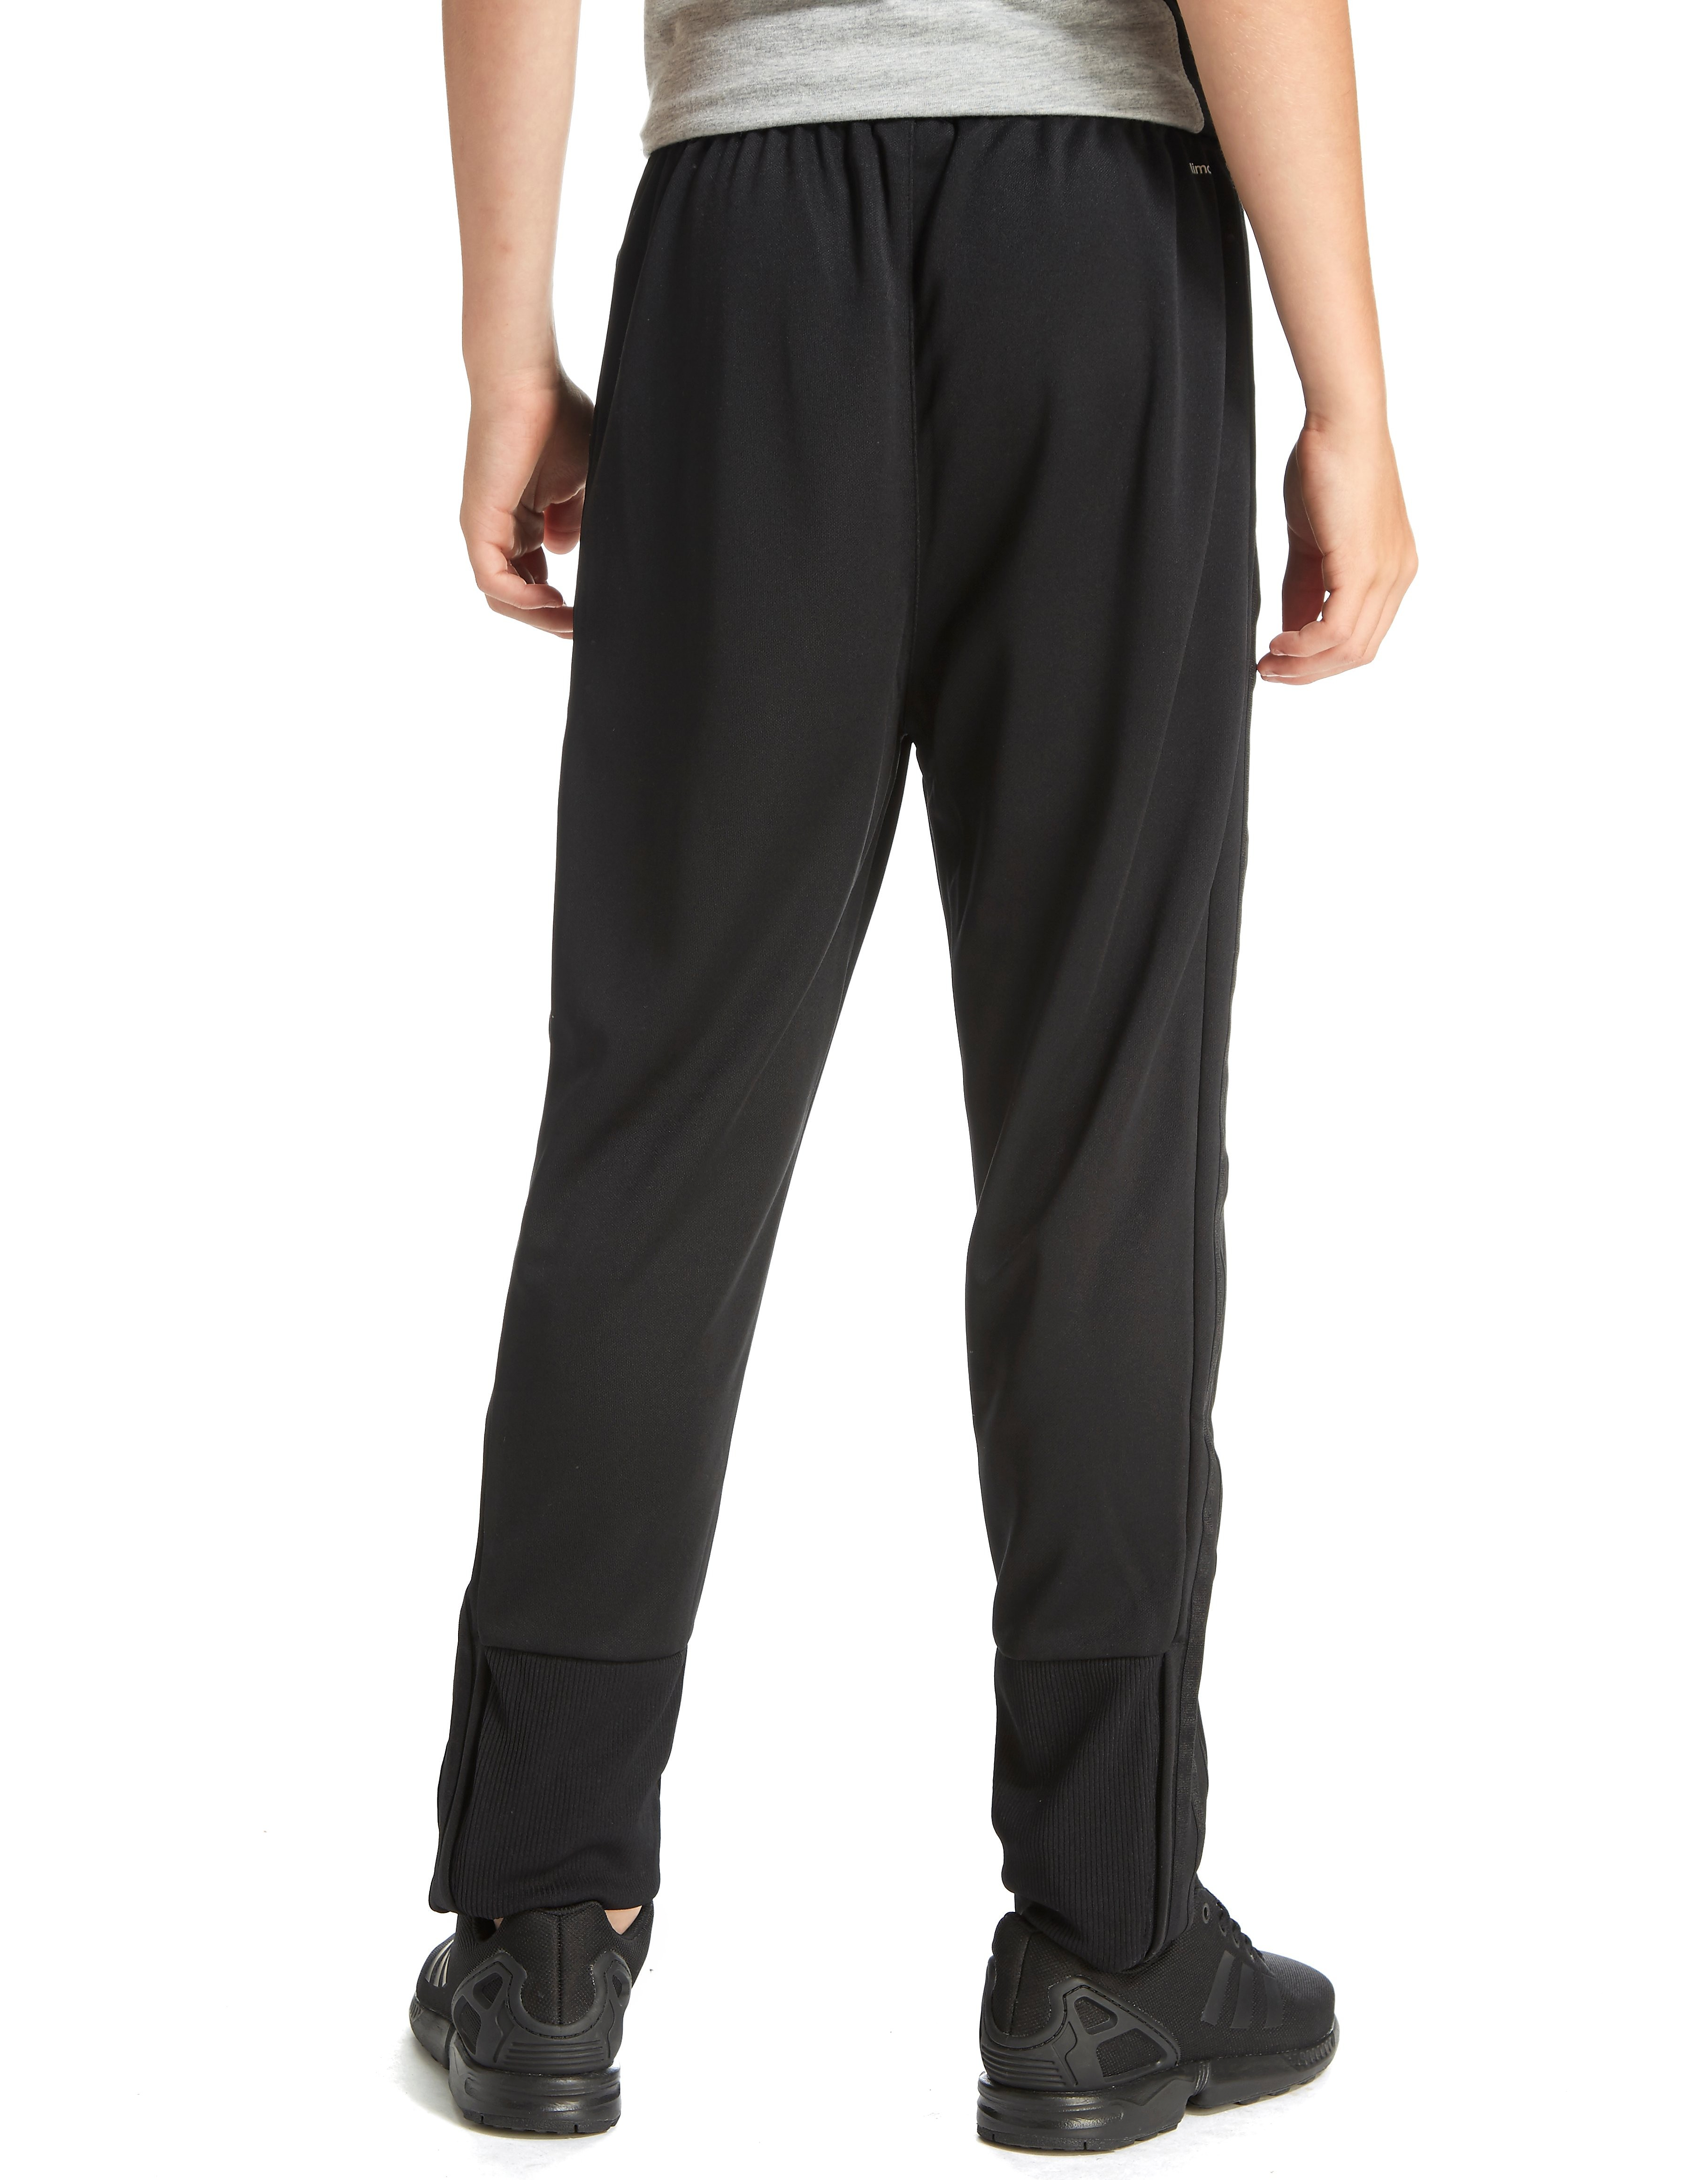 adidas Performer 3-Stripes Tiro Track Pants Junior